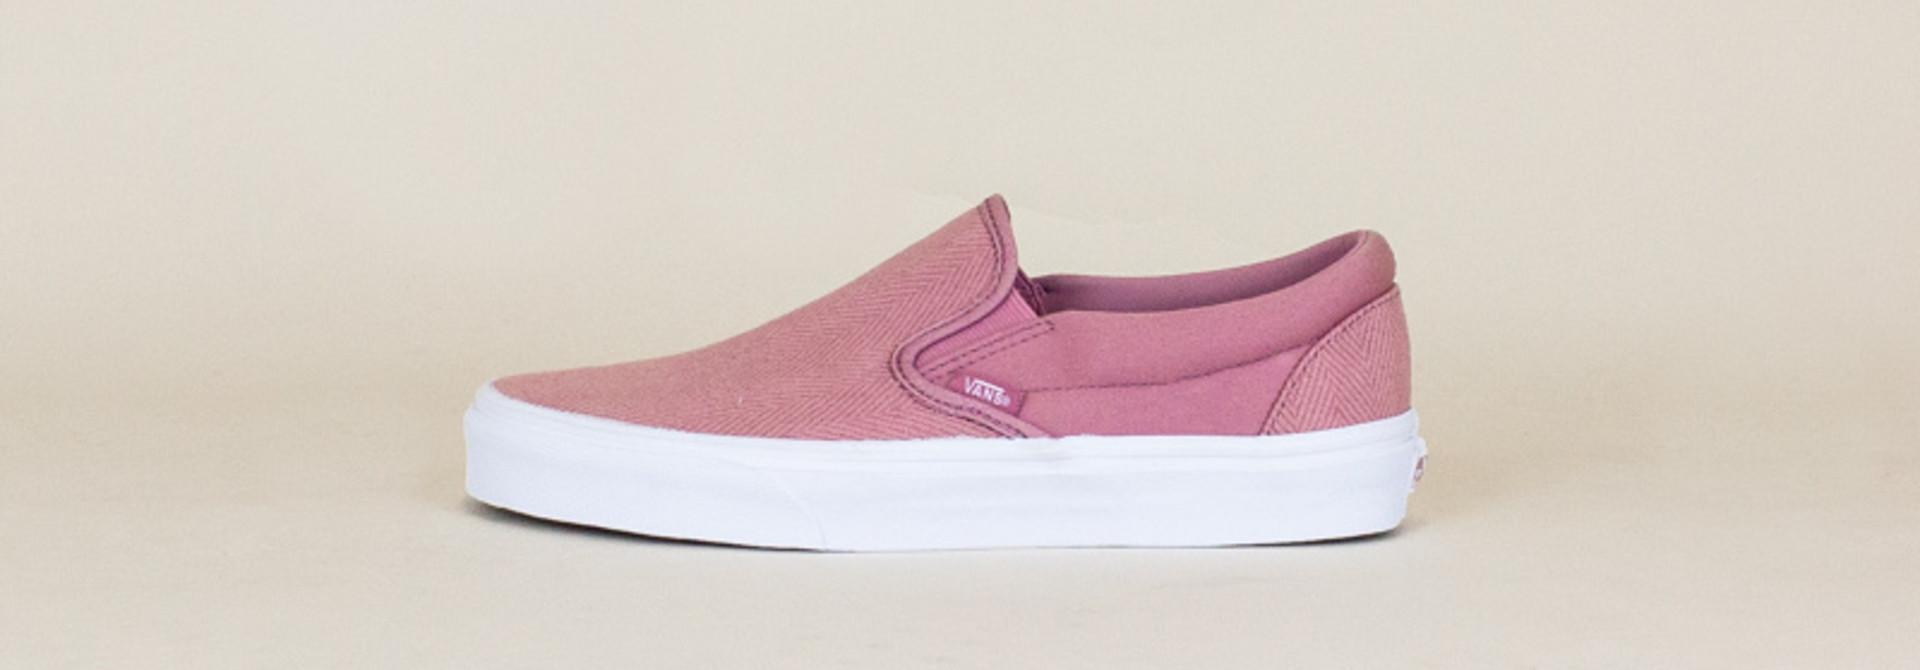 Vans Classic Slip-On -  Pink